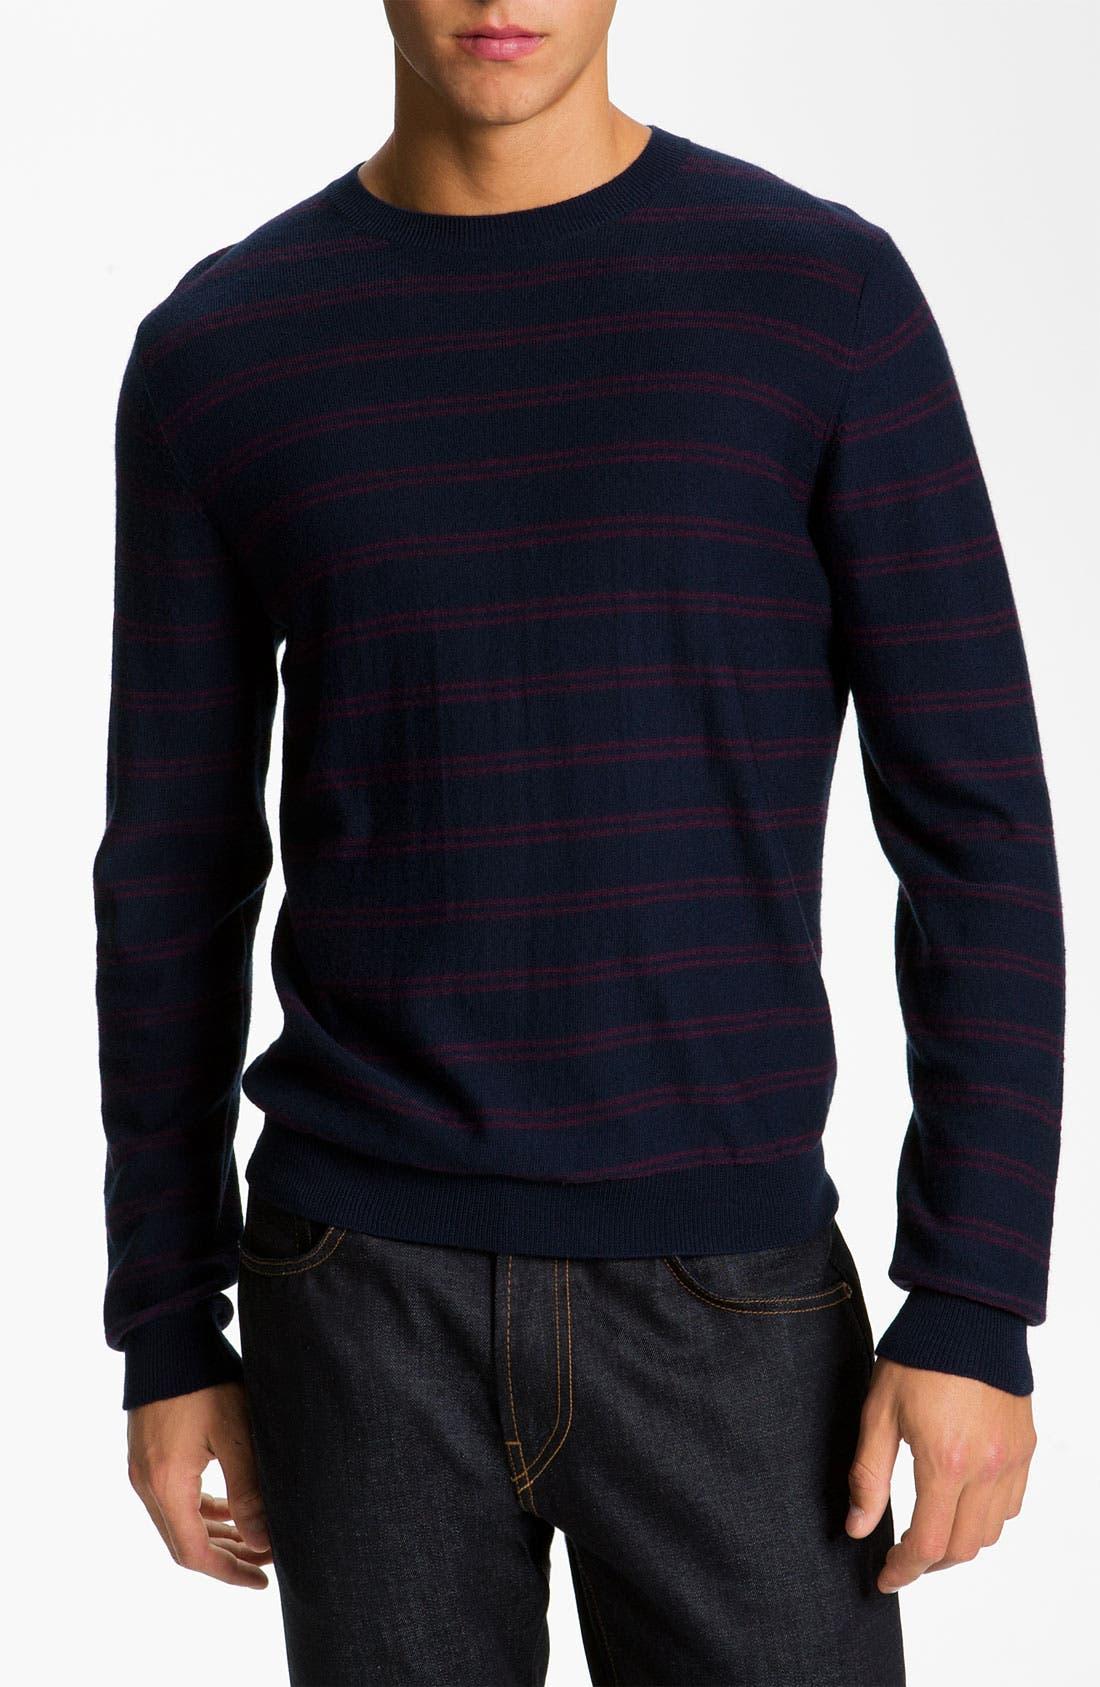 Main Image - Cullen89 Merino Wool Sweater